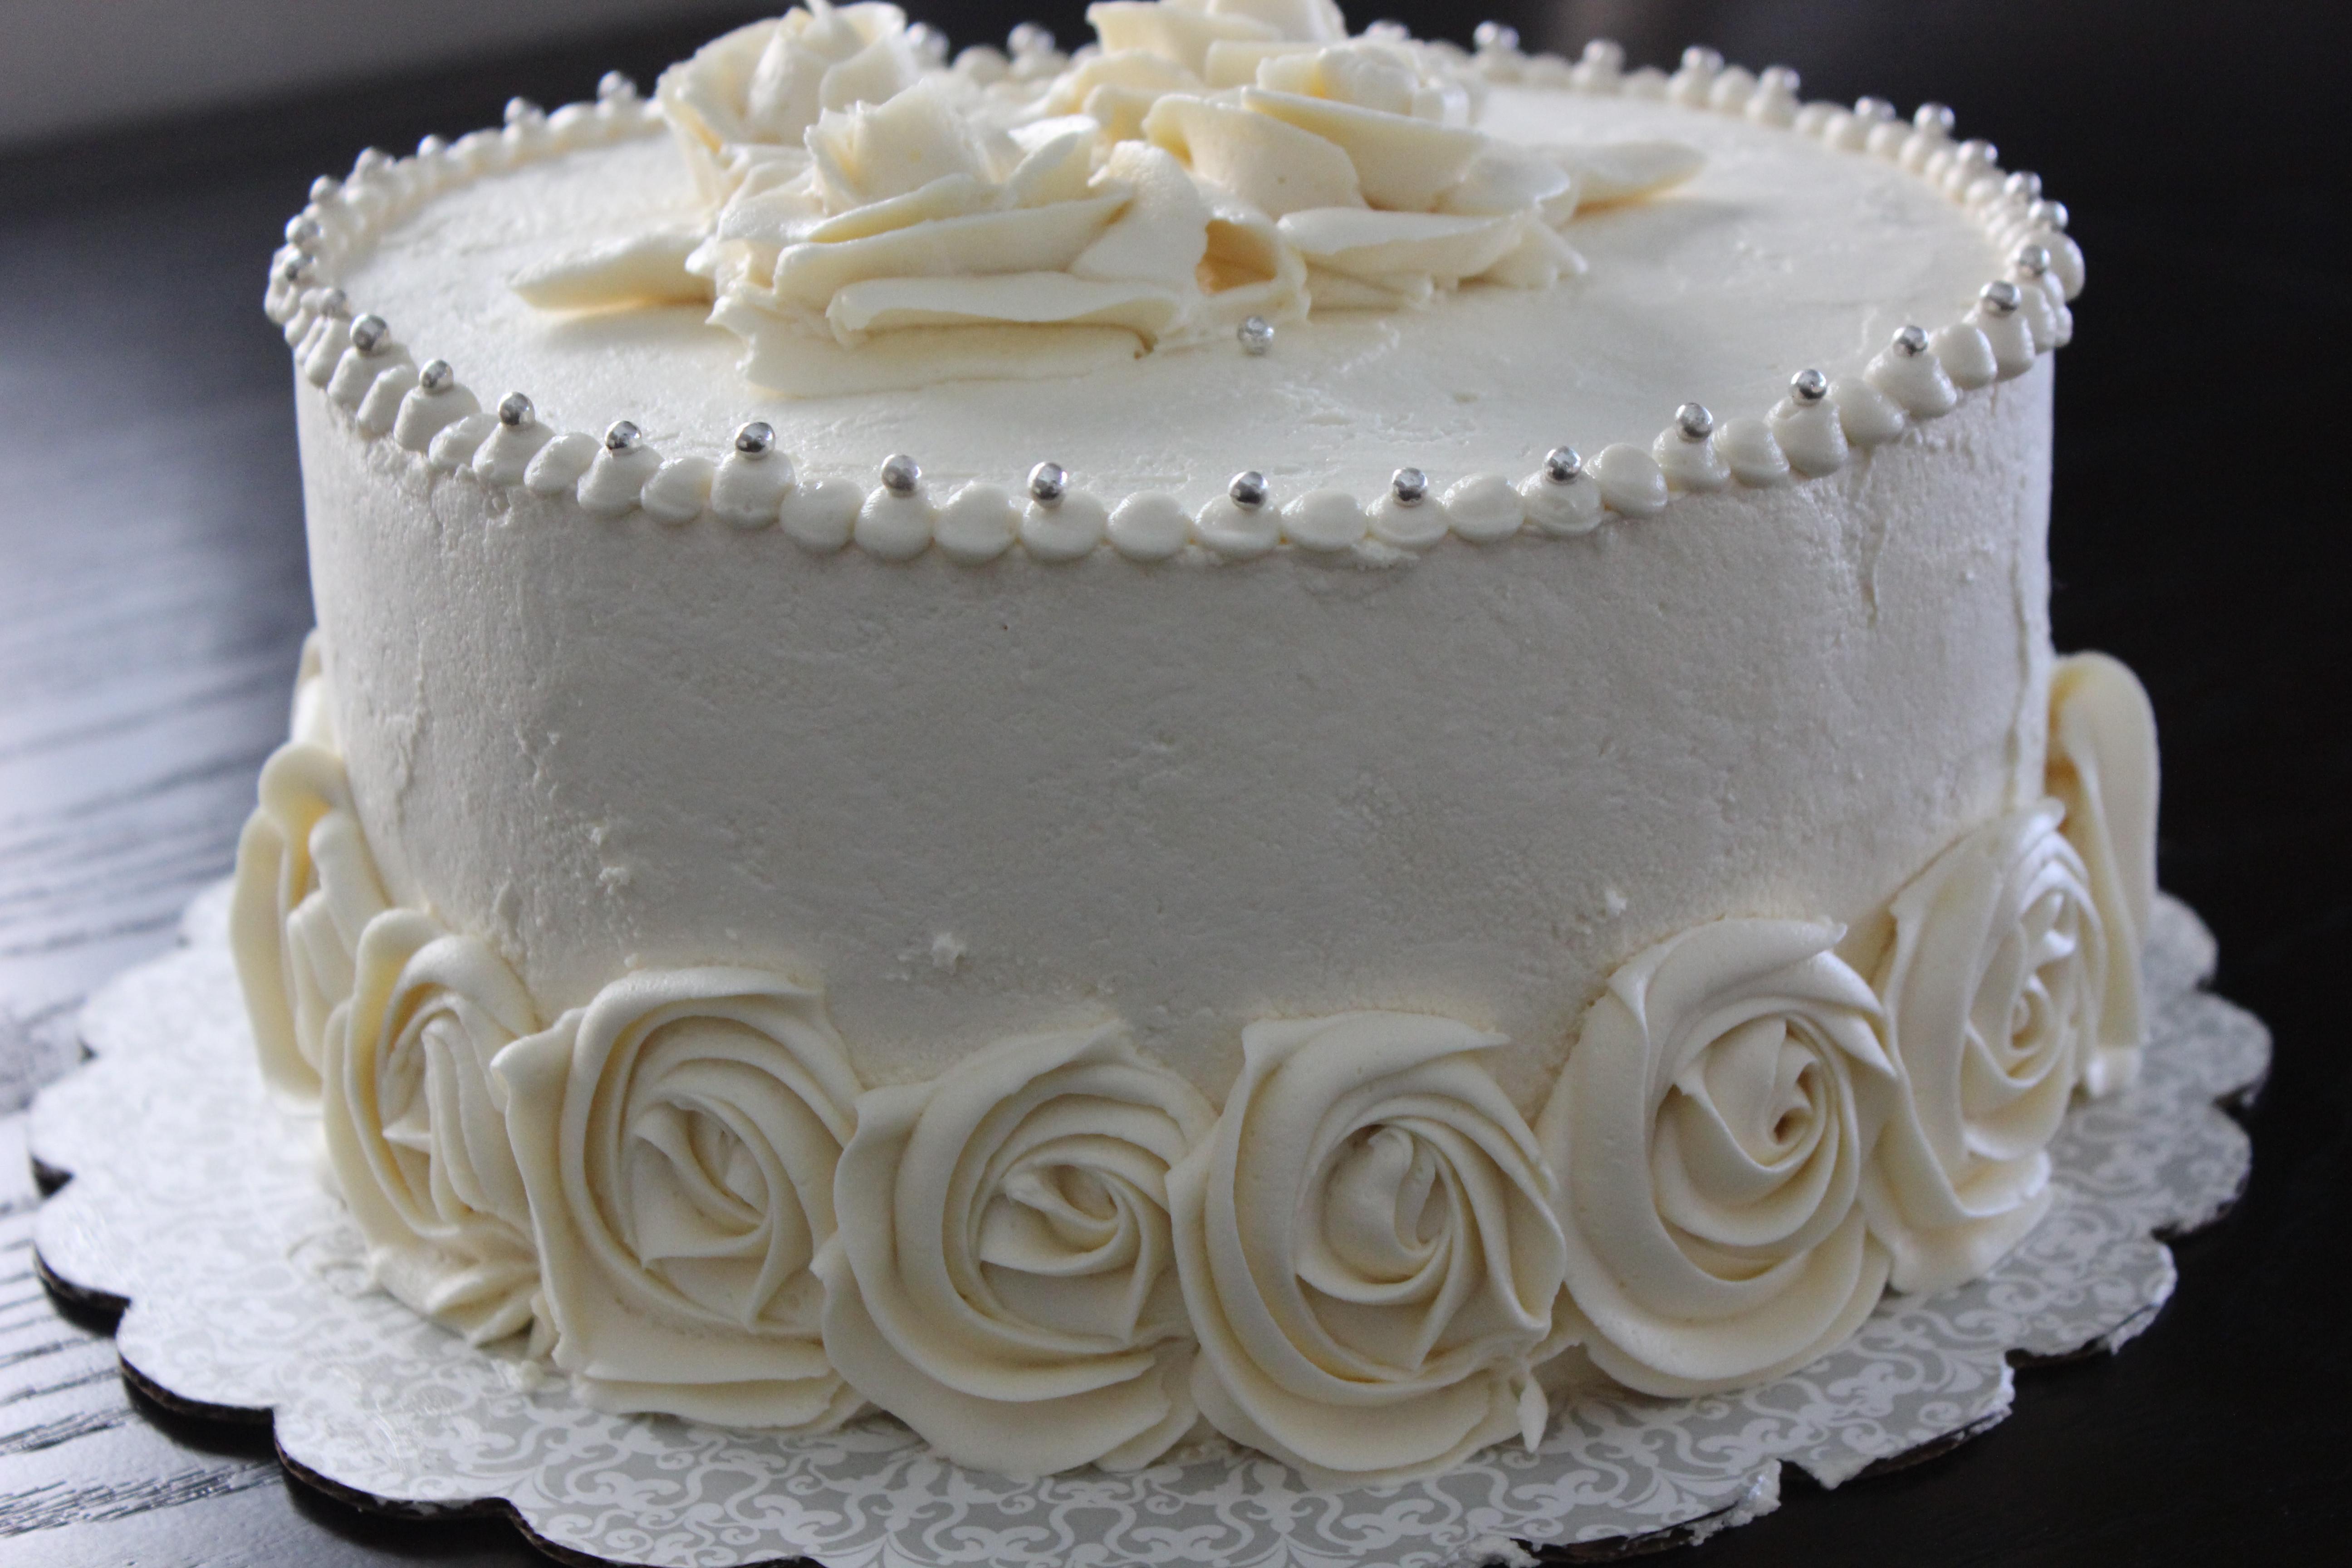 60Th Wedding Anniversary Cakes Ideas  60th Wedding Anniversary Decorations